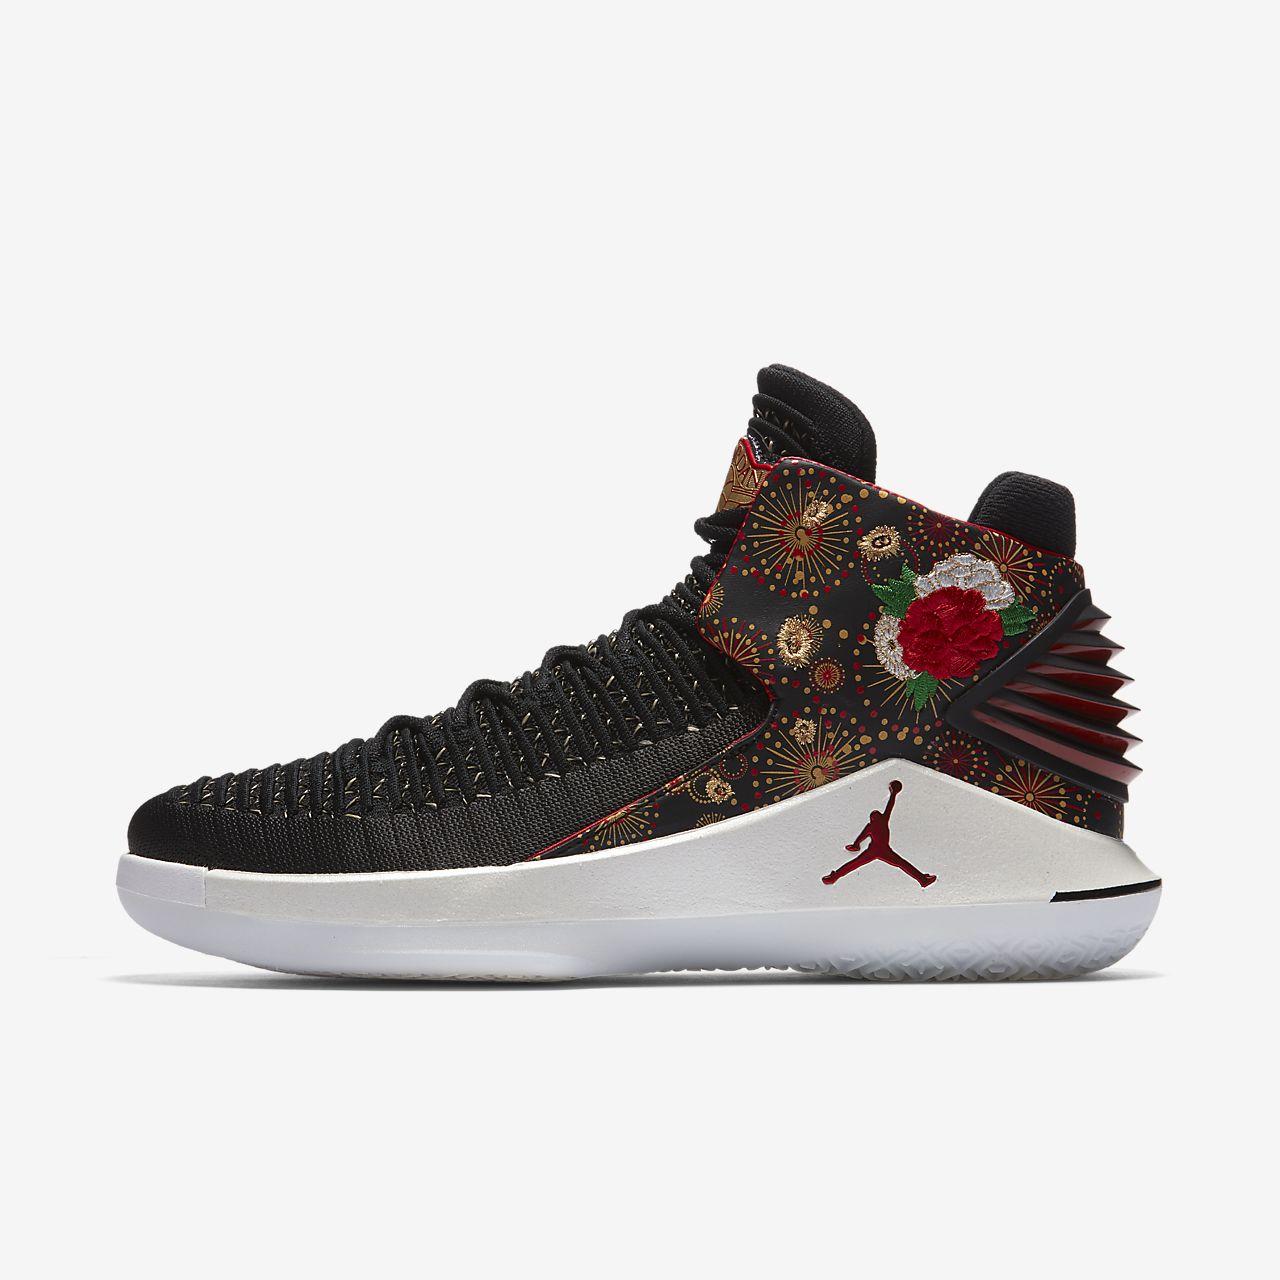 670bd8a2641 รองเท้าบาสเก็ตบอลผู้ชาย Air Jordan XXXII